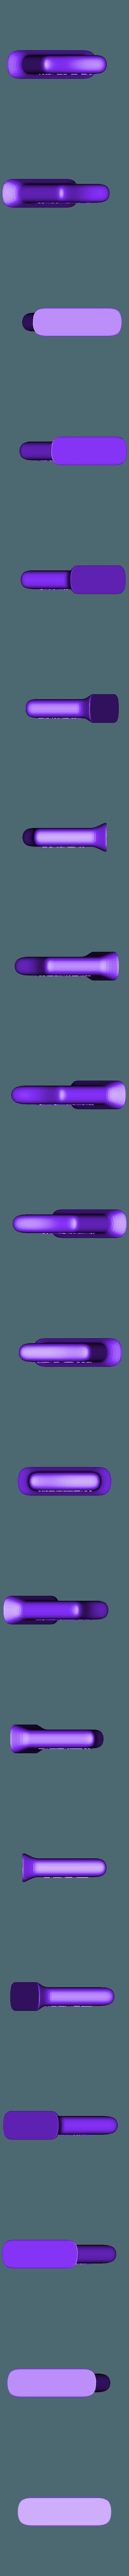 nachkriegsjugend.STL Download free STL file gravestone concept - retourning the favour • 3D print model, syzguru11